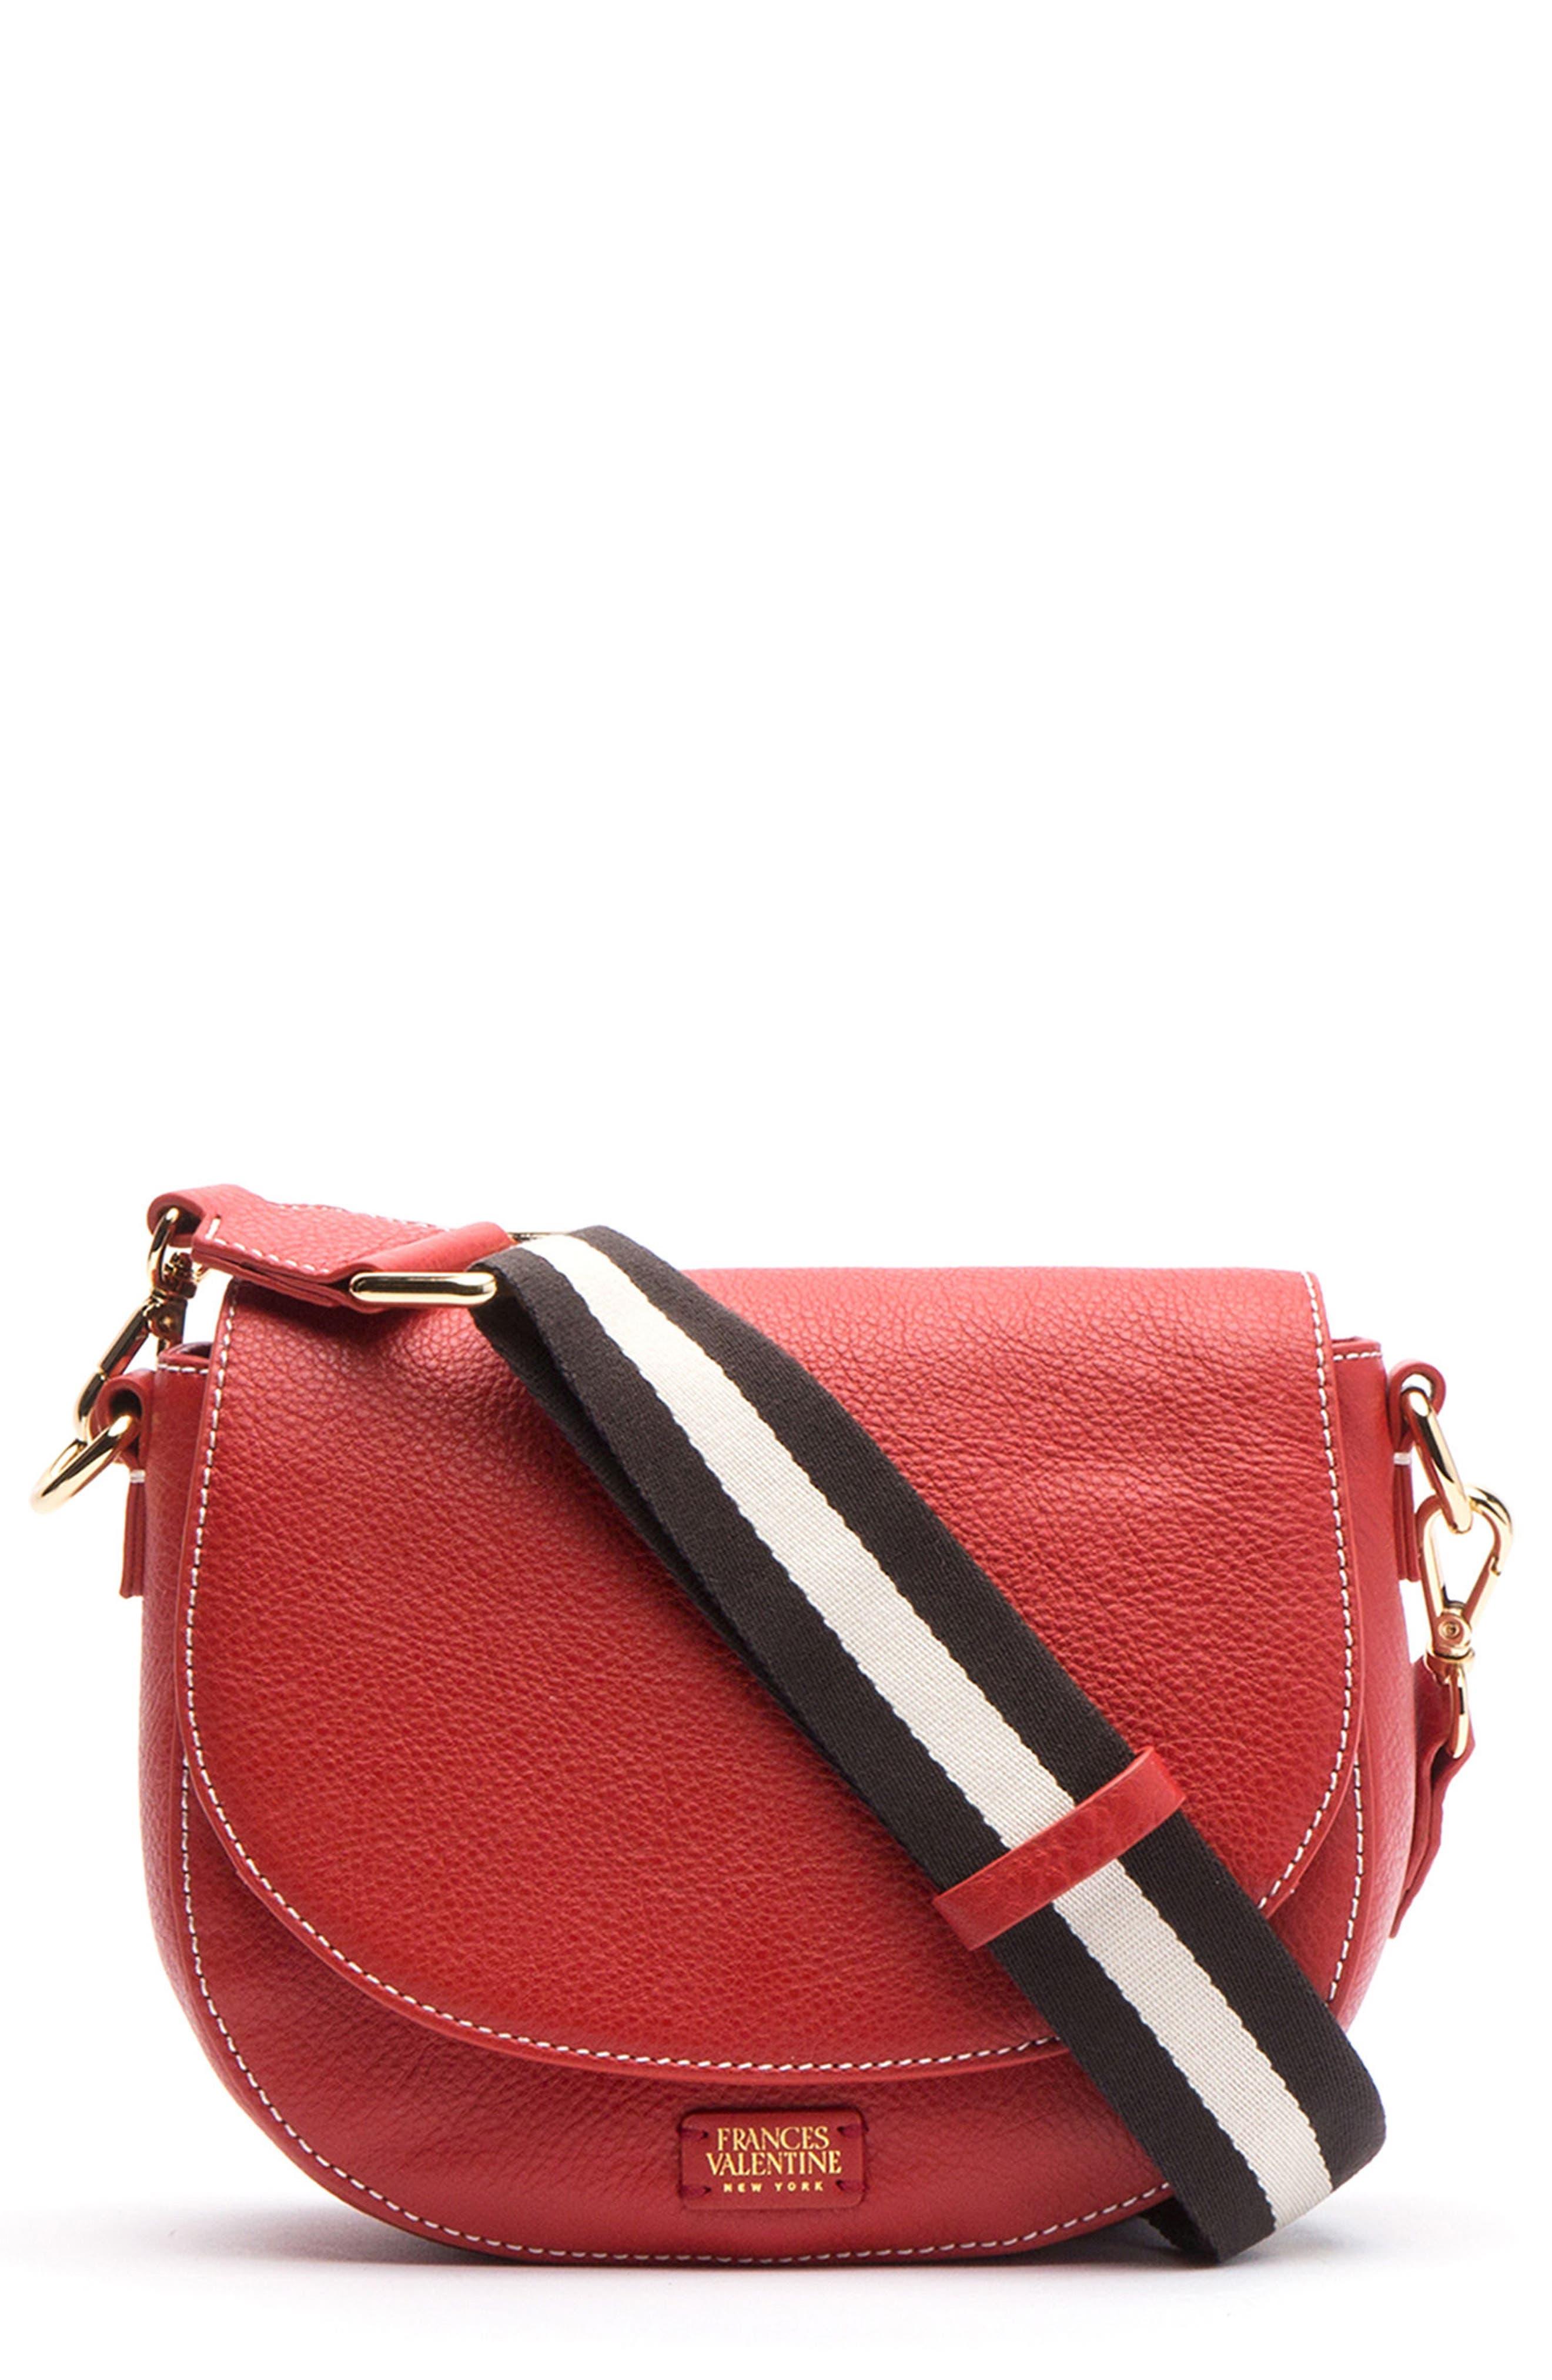 FRANCES VALENTINE Mini Ellen Leather Crossbody Bag